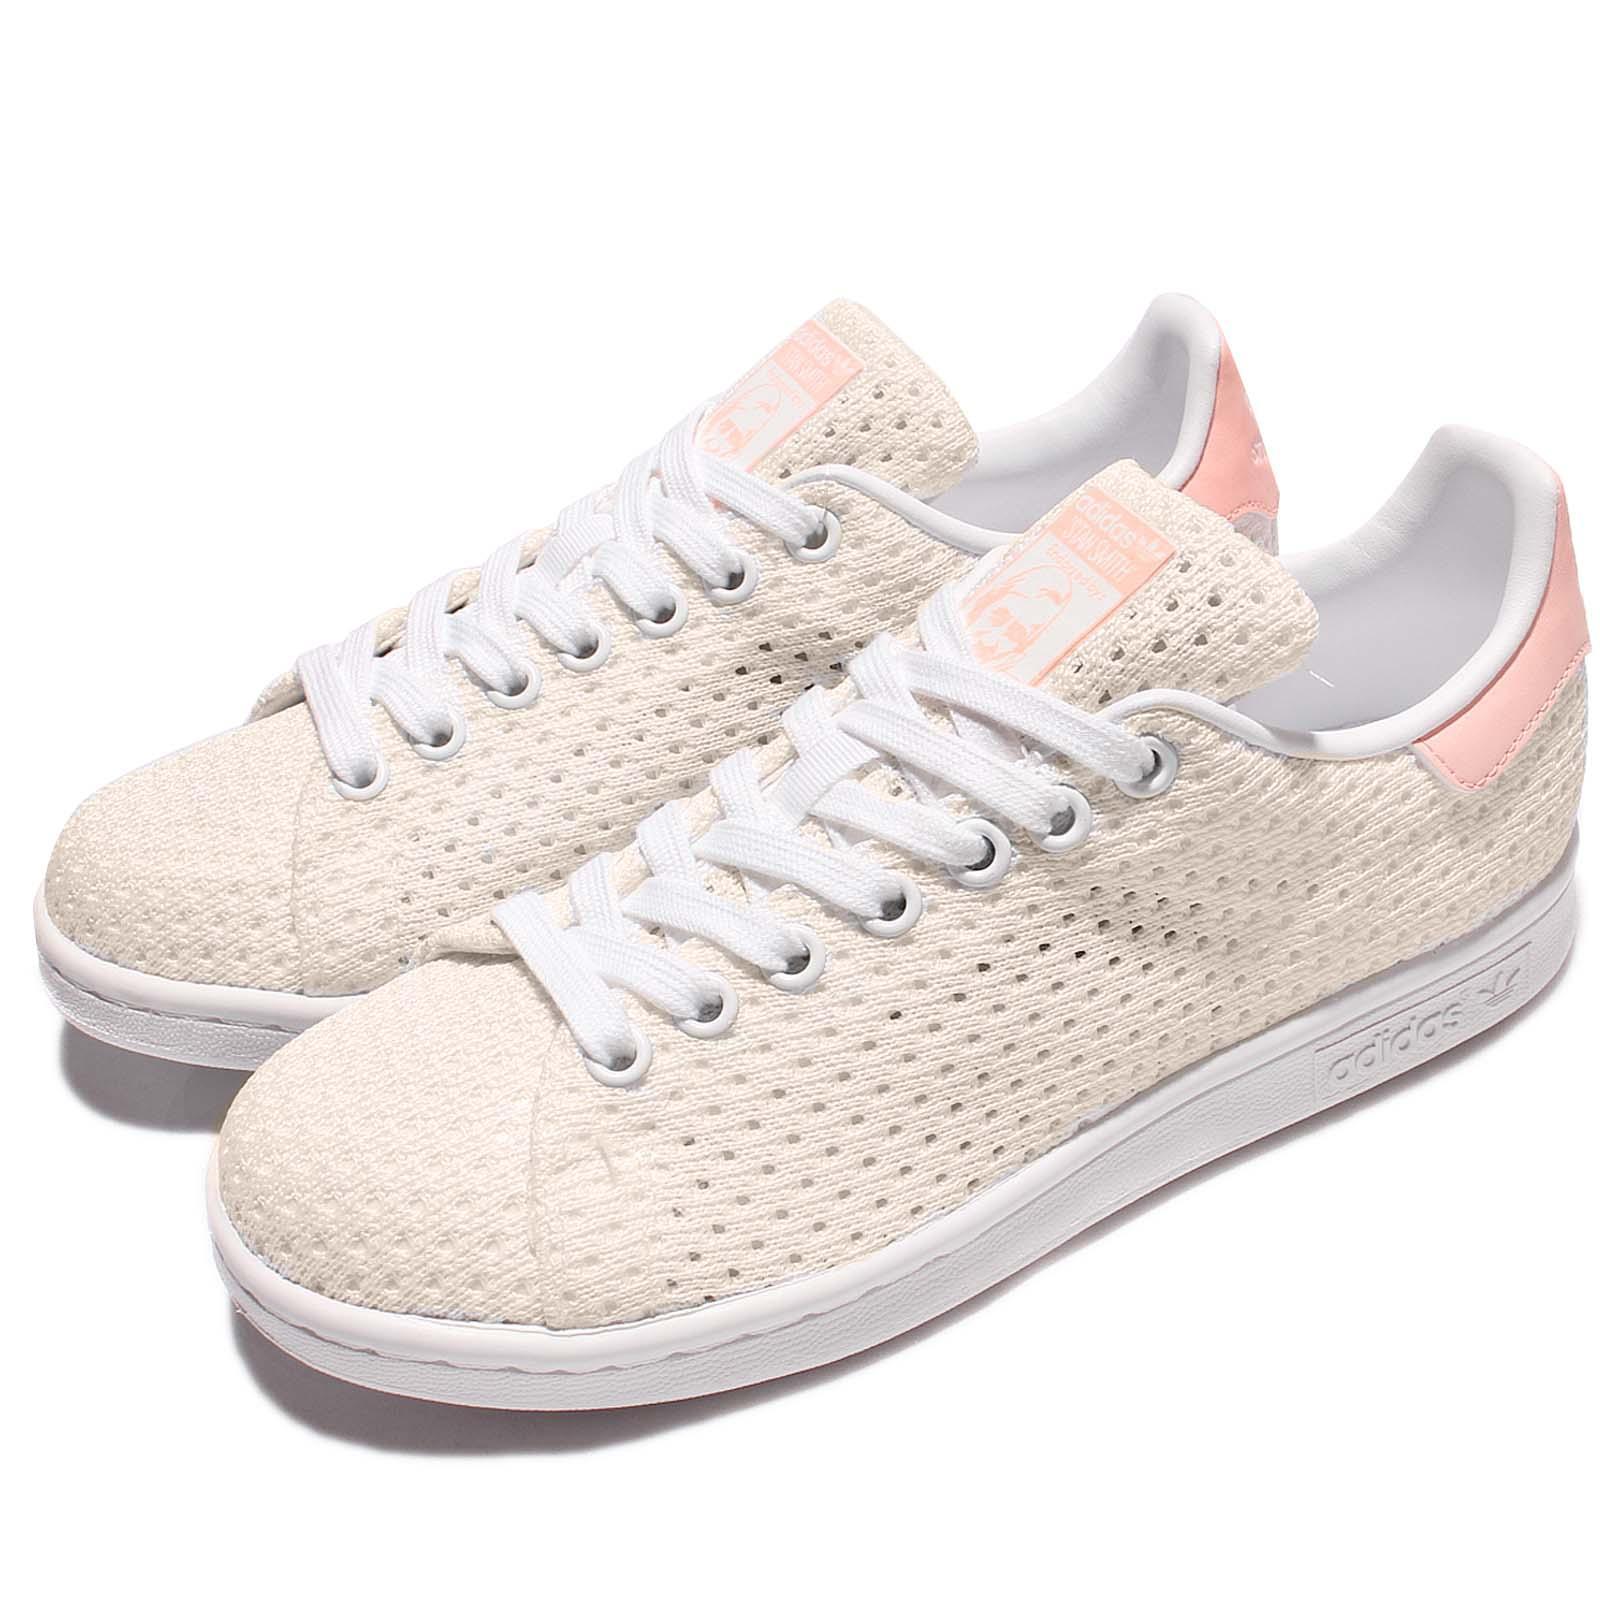 acheter en ligne 570ee 73c36 Details about adidas Originals Stan Smith W Mesh White Pink Classic Women  Casual Shoes S82256